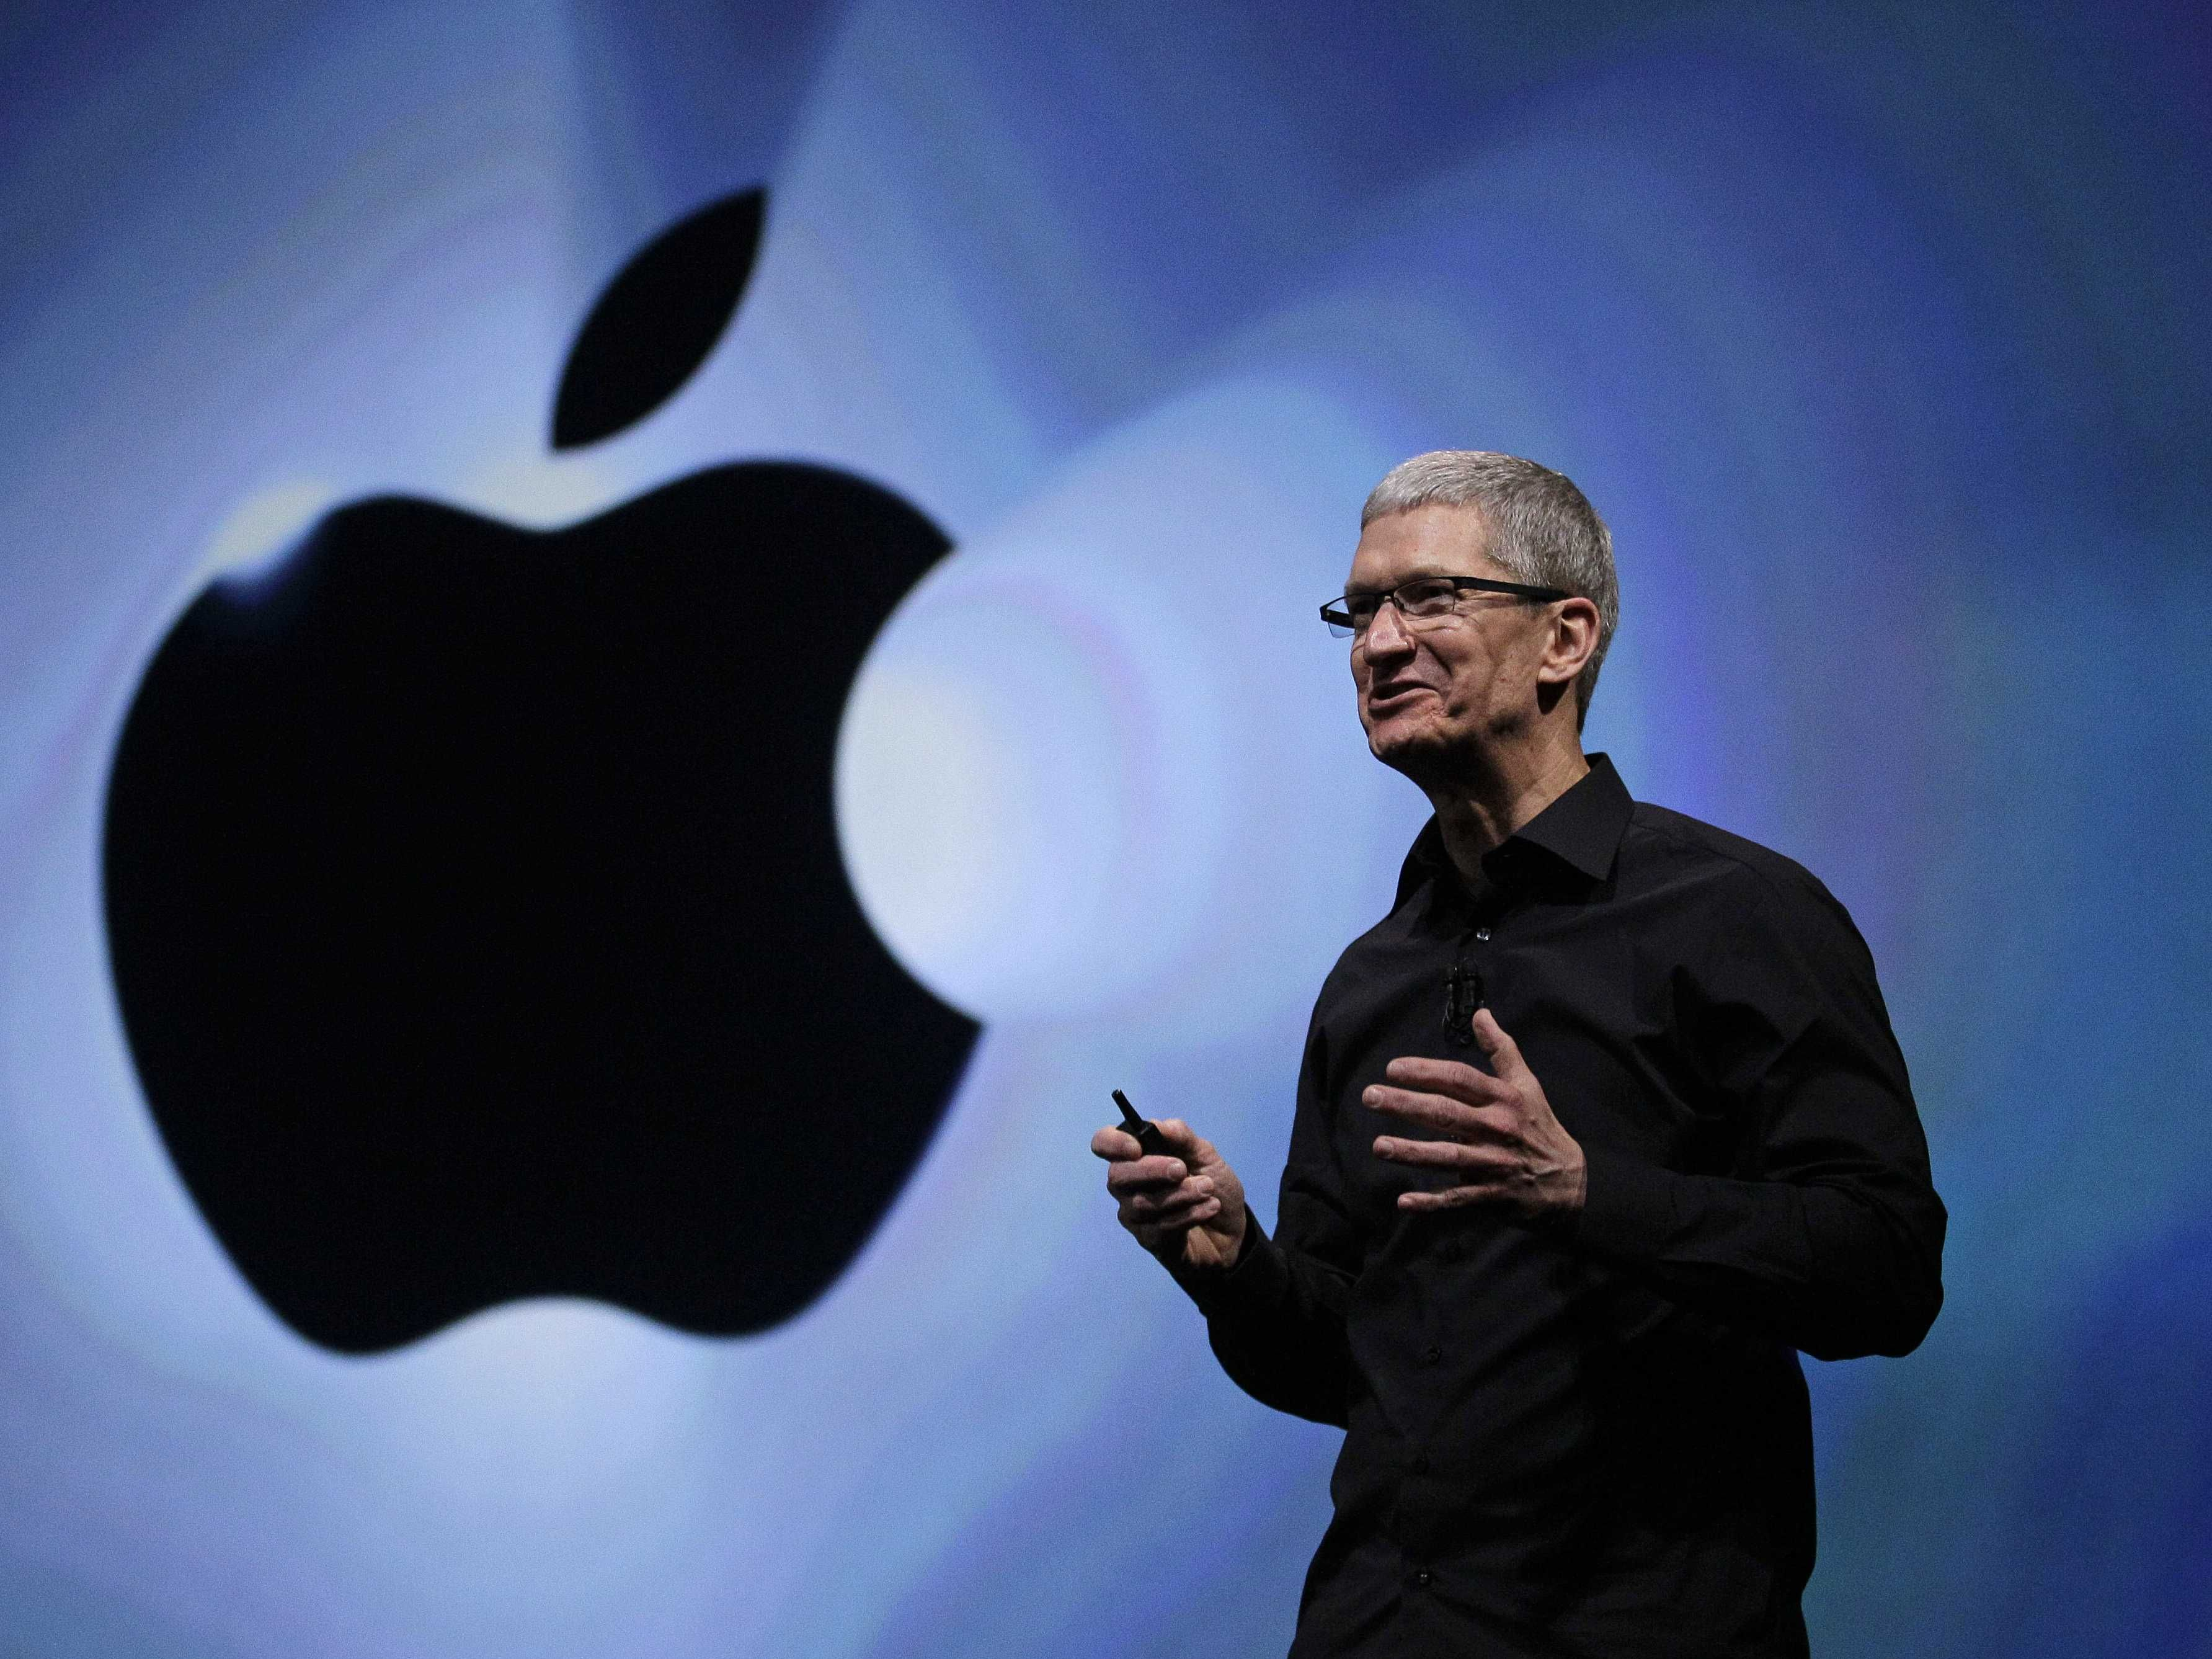 e984112e0a3094ef0b718c13c798fc36 - How Hard Is It To Get A Job At Apple Retail